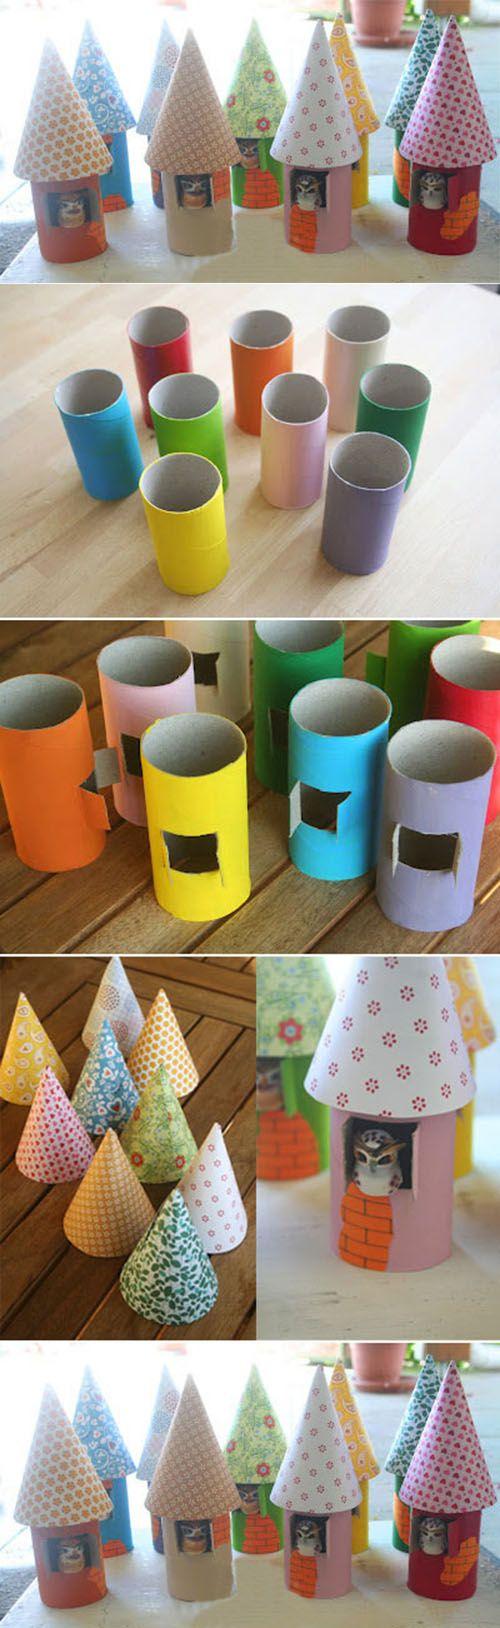 Cute Paper Craft | DIY & Crafts Tutorials